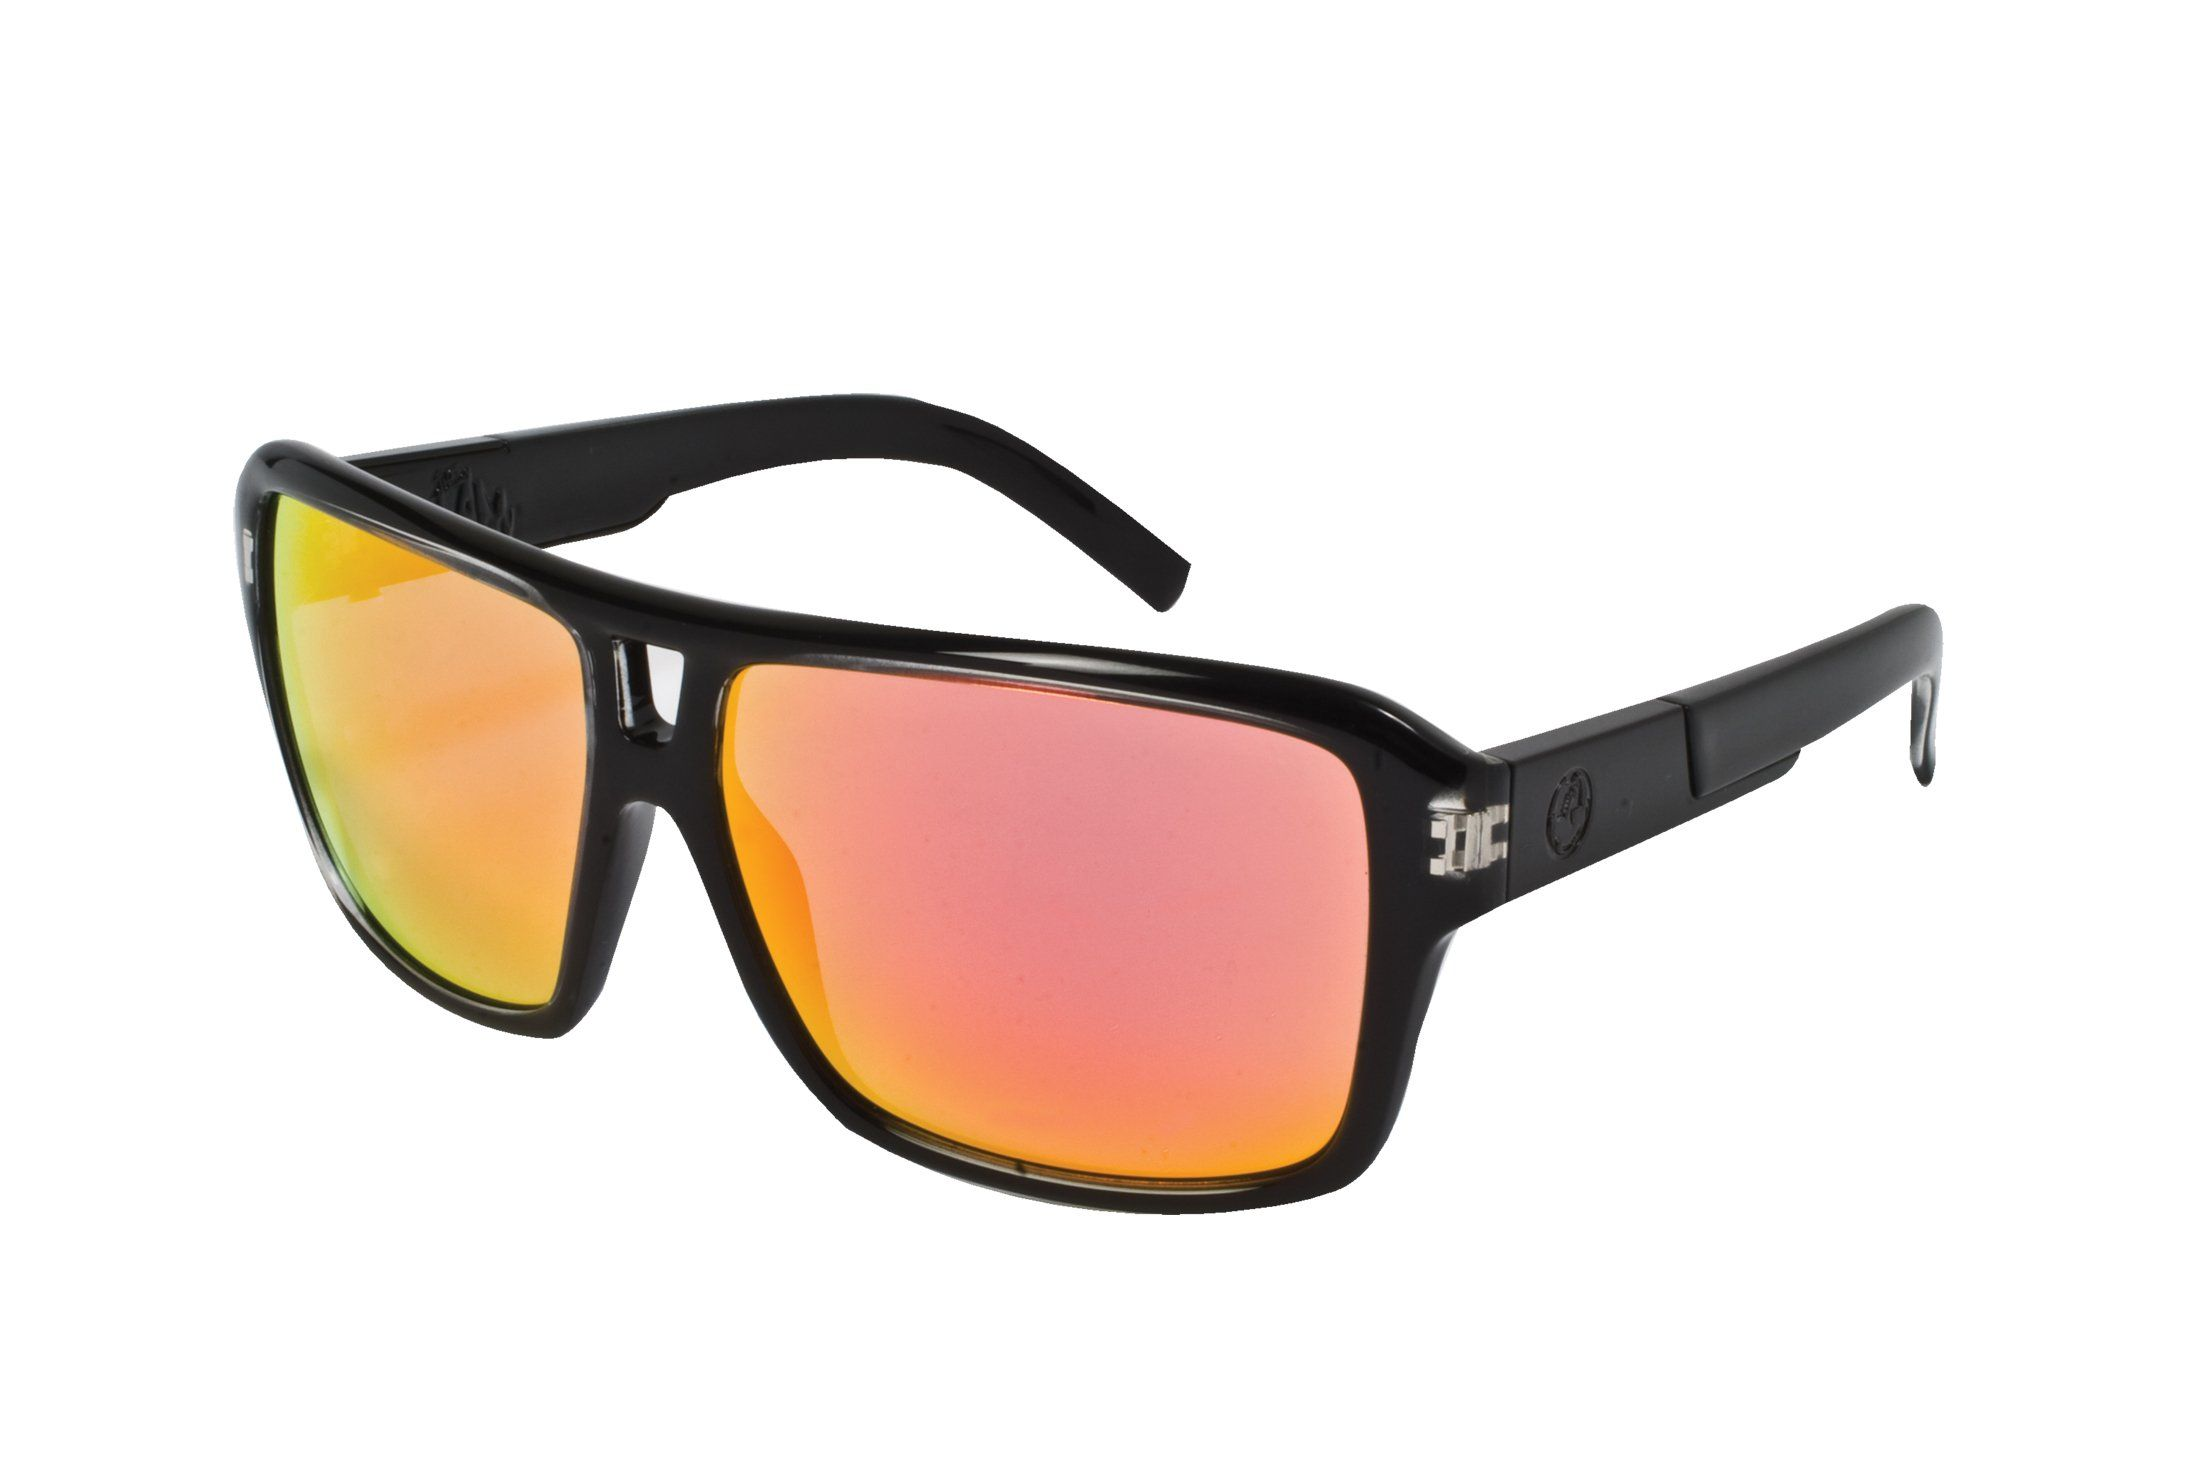 f727fedac24 Dragon Calavera Sunglasses Lenses